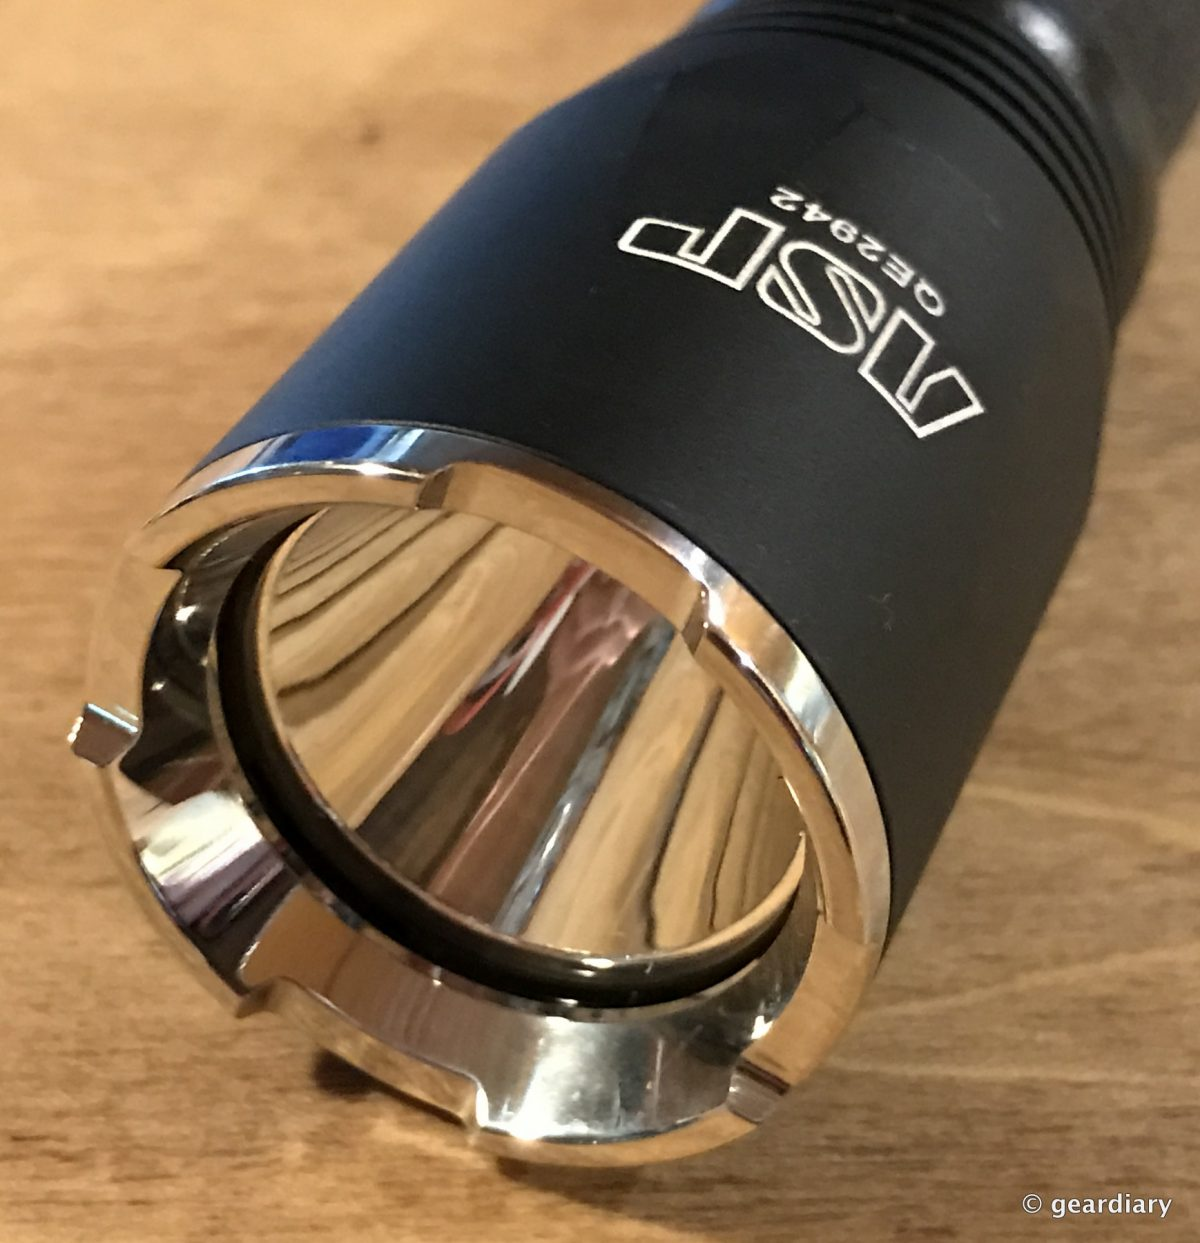 Bright Cree XPL LED ASP Turbo CR Tactical LED Flashlight 920 Lumens 2 CR123A Lithium Batteries